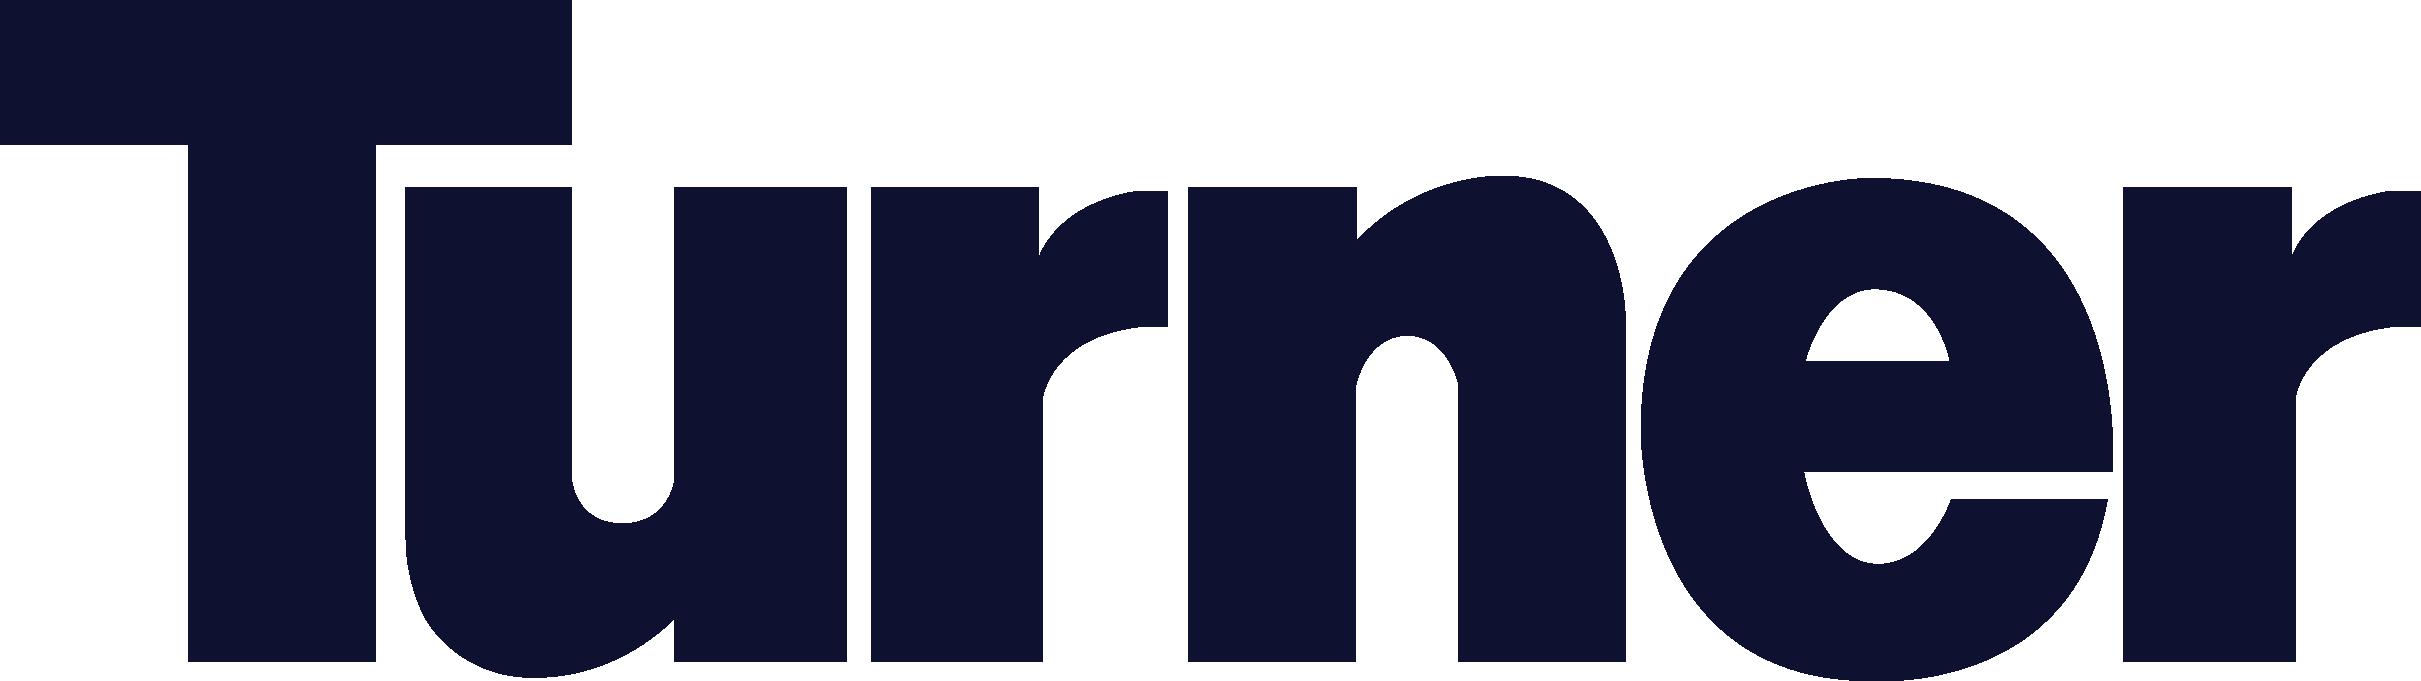 Turnerlogo